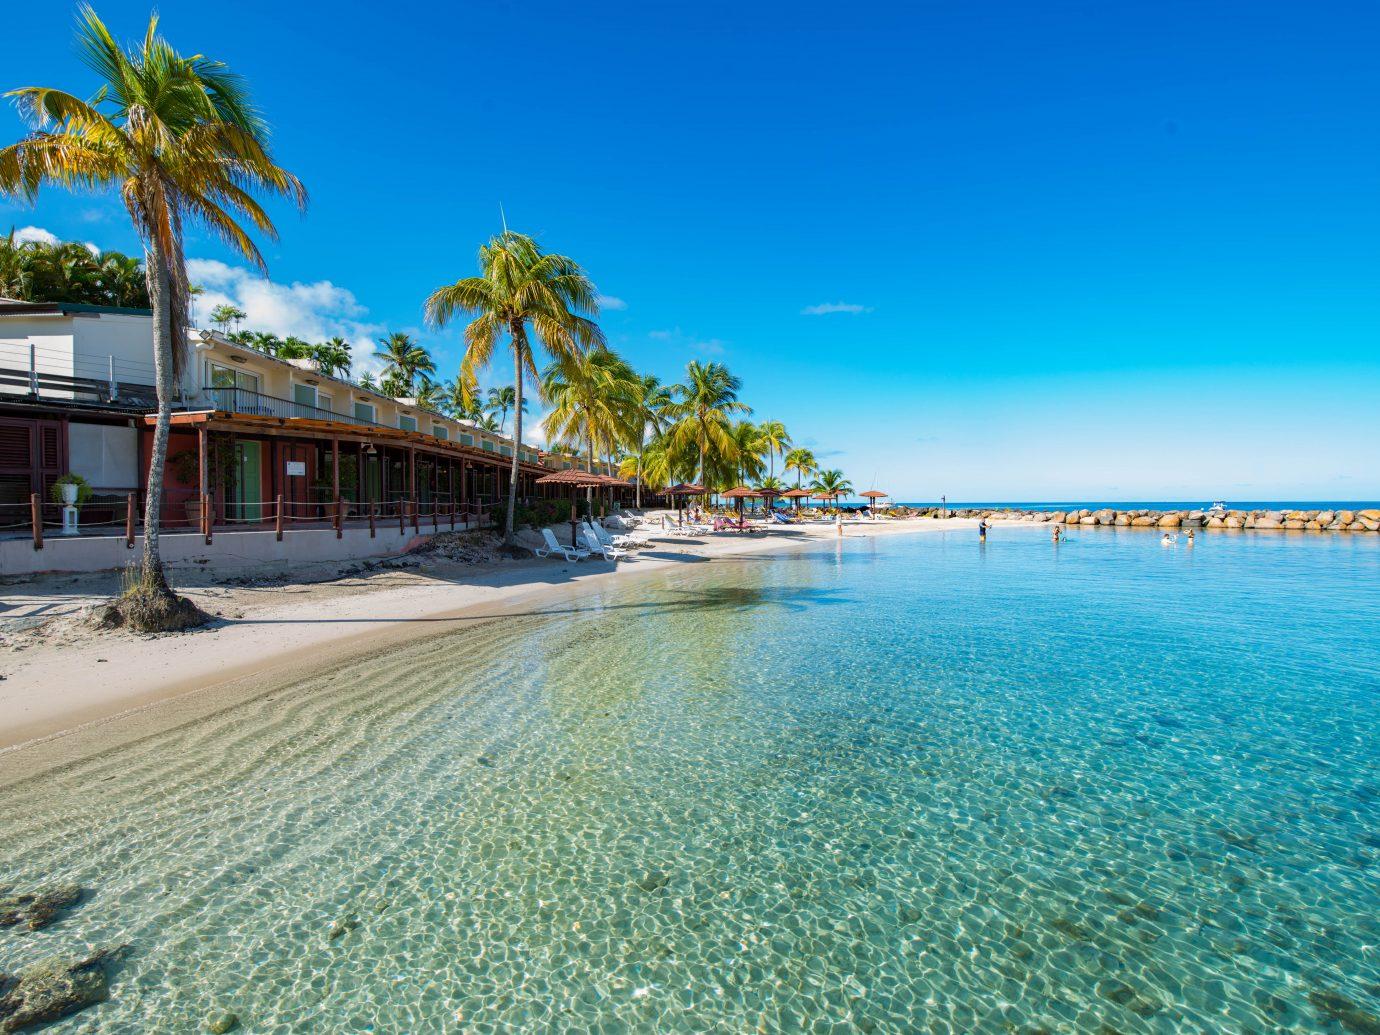 Beachfront at Hotel Bakoua in Martinique